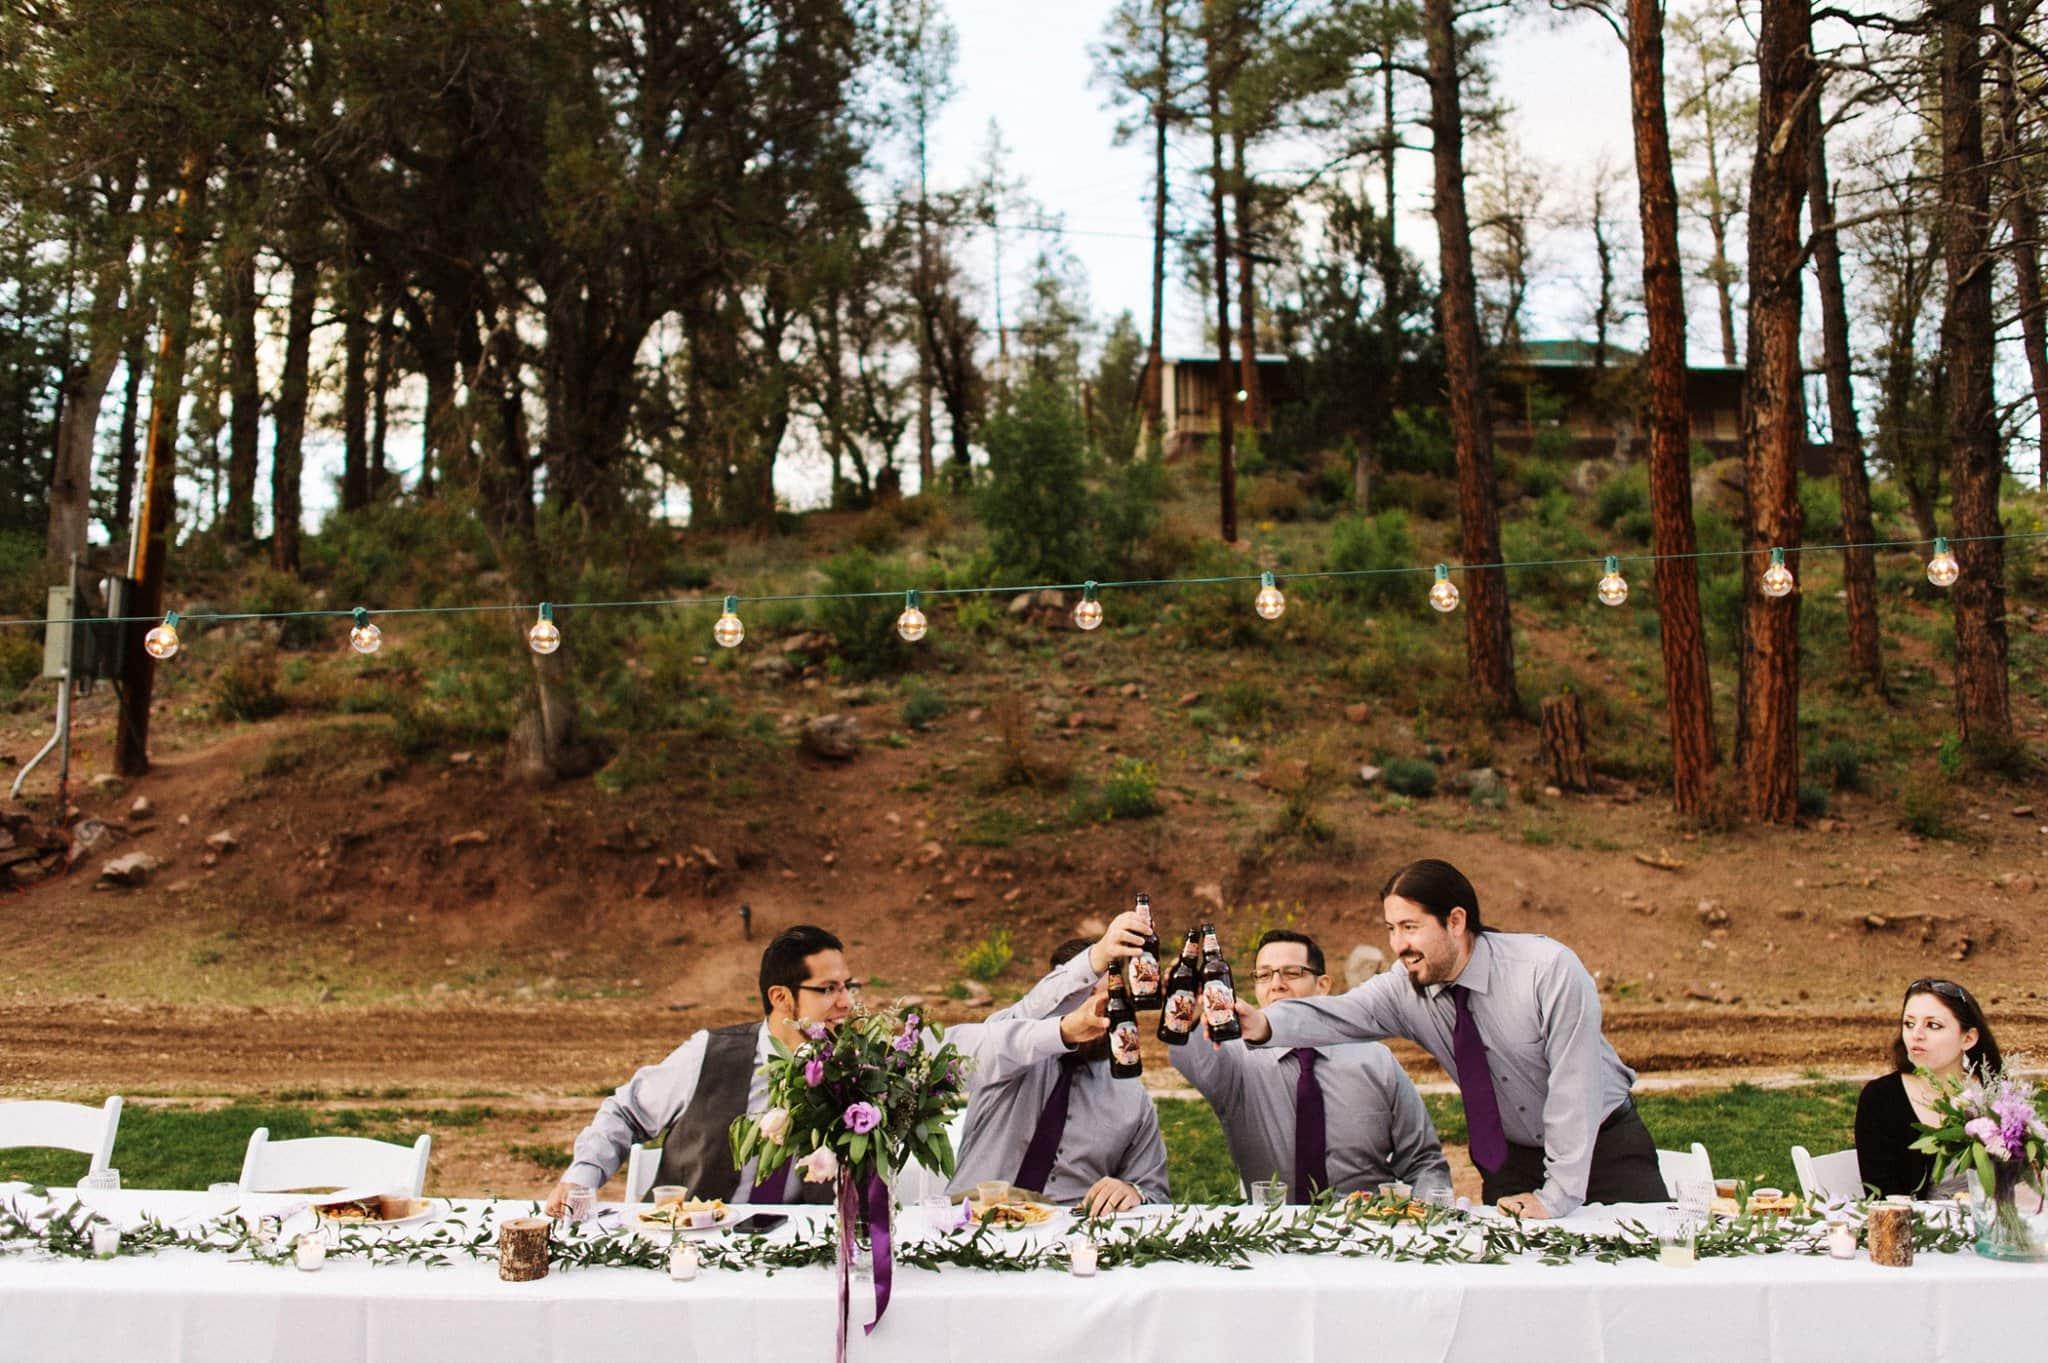 Tonto Camp Creek wedding reception by Heather Jowett